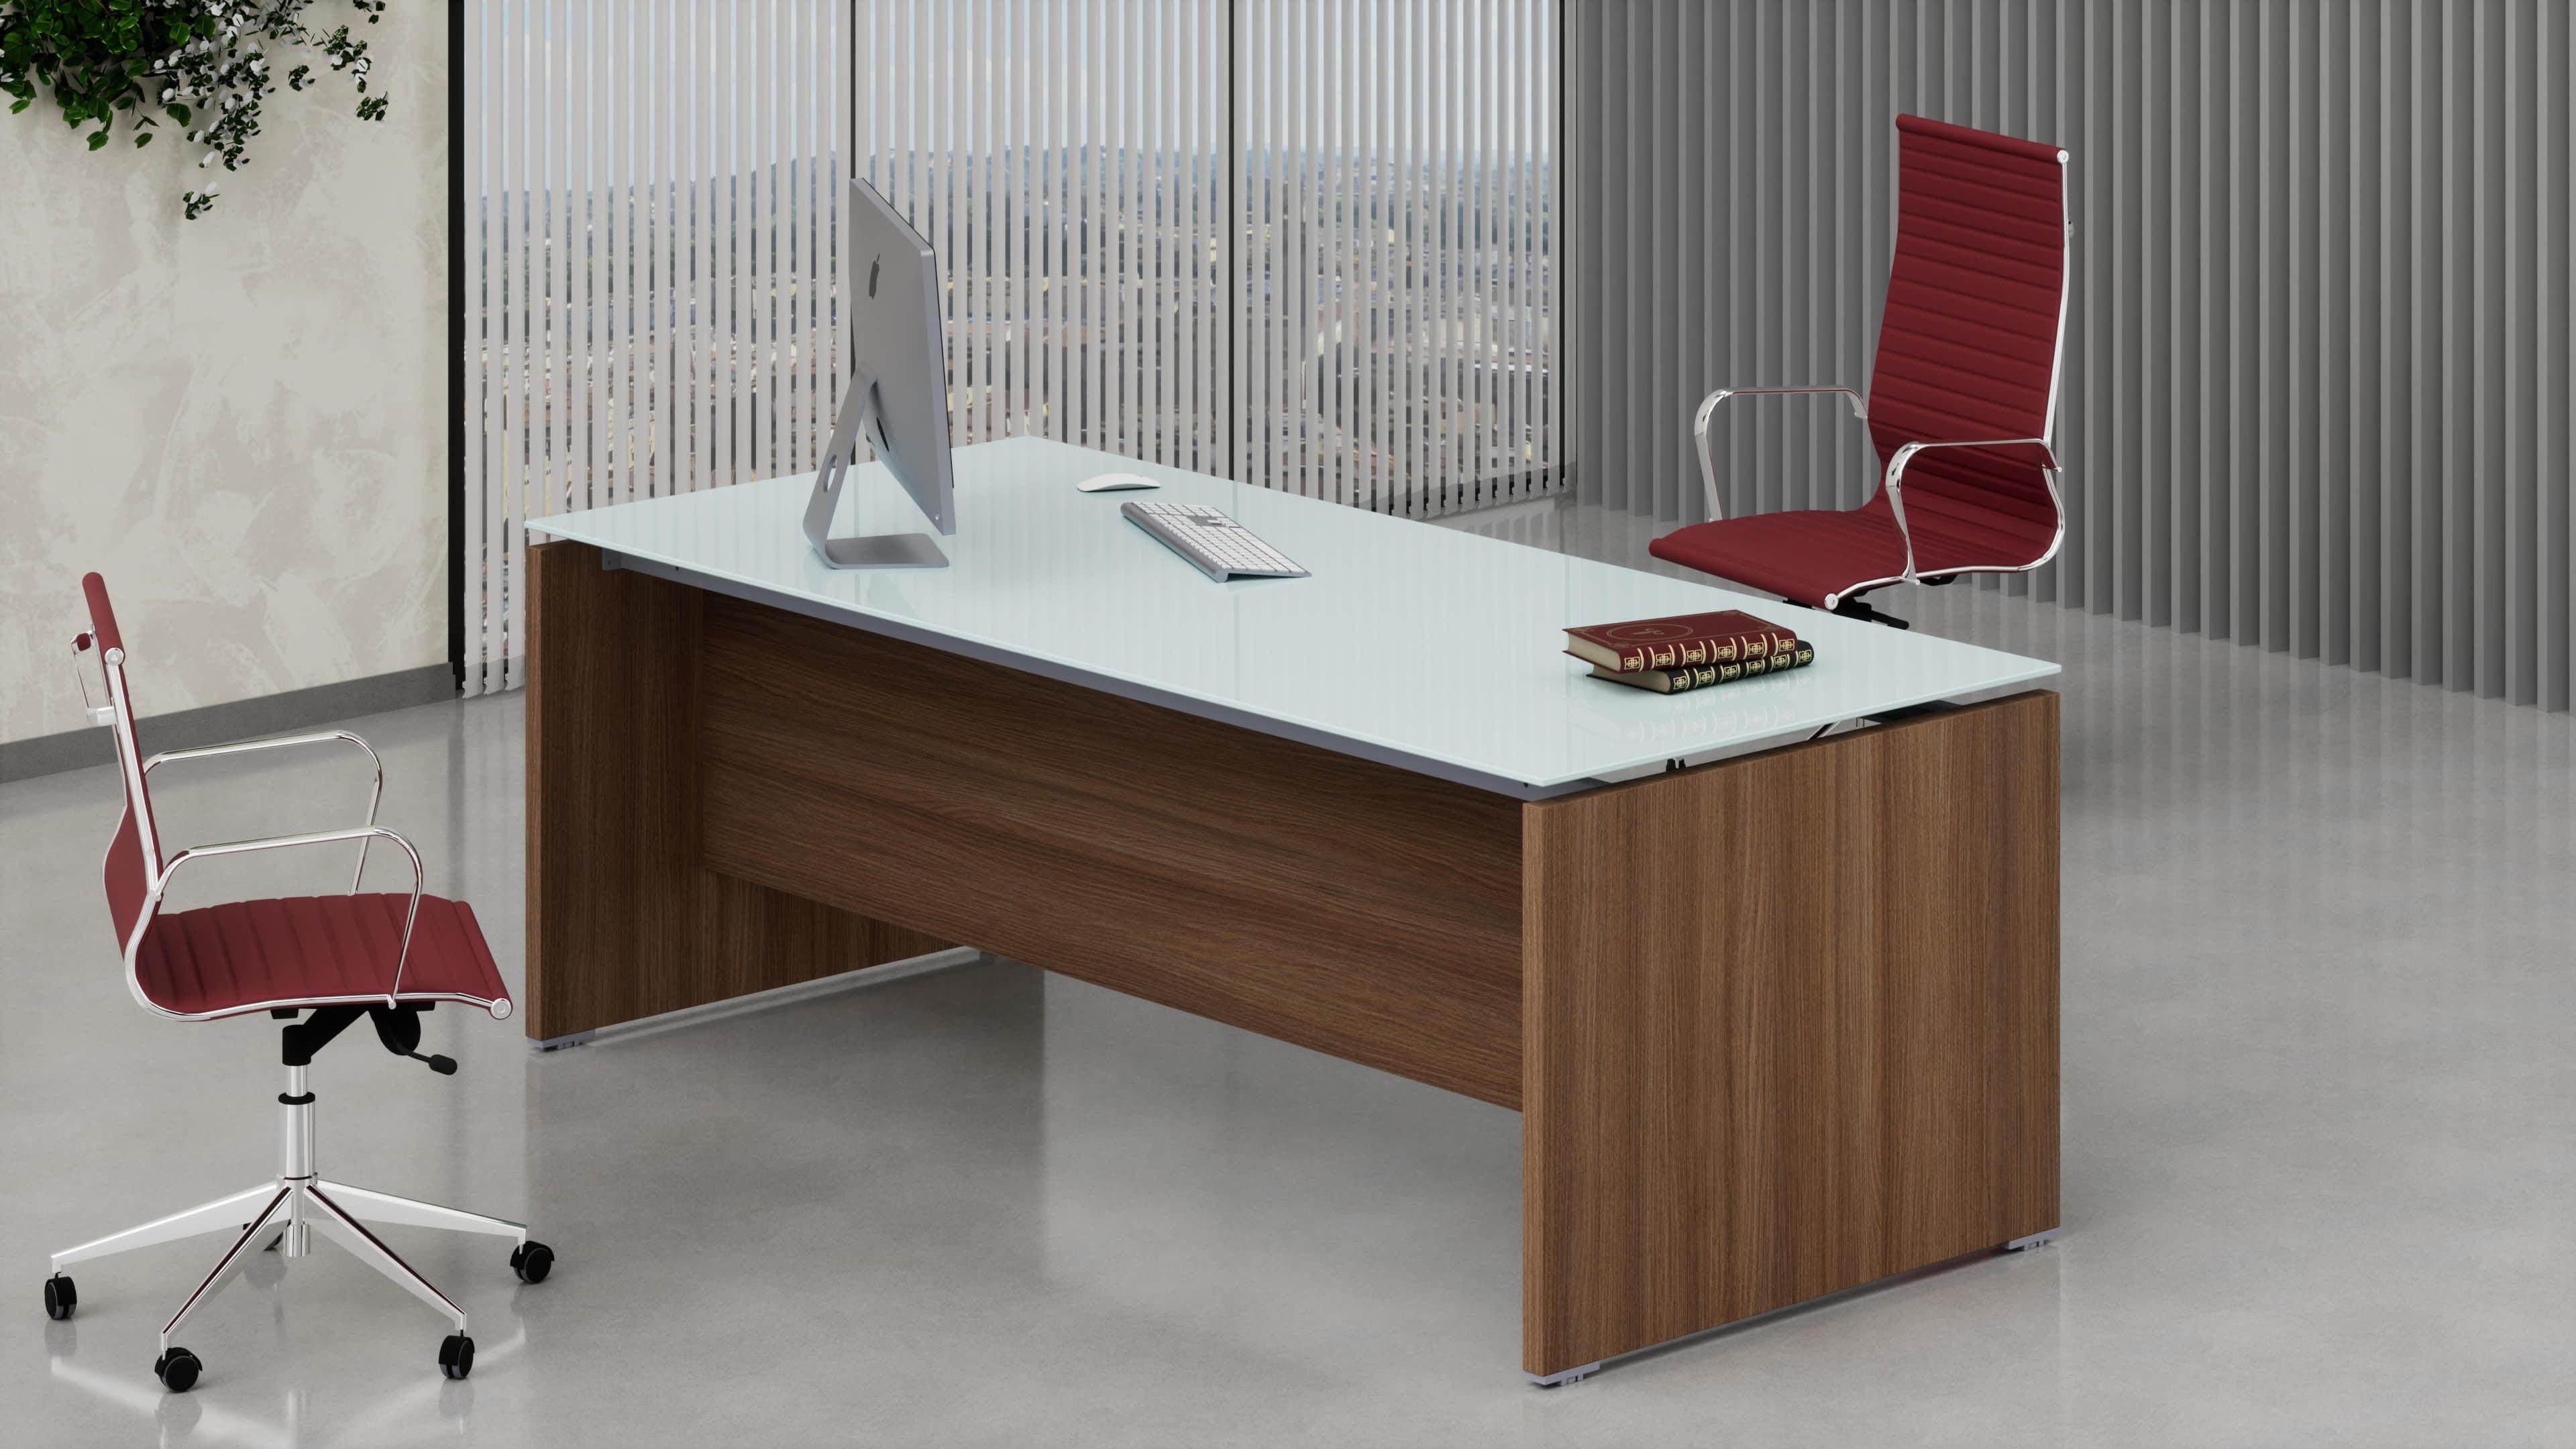 compra mobili online excellent amazing vendita mobili di On mobili compra online